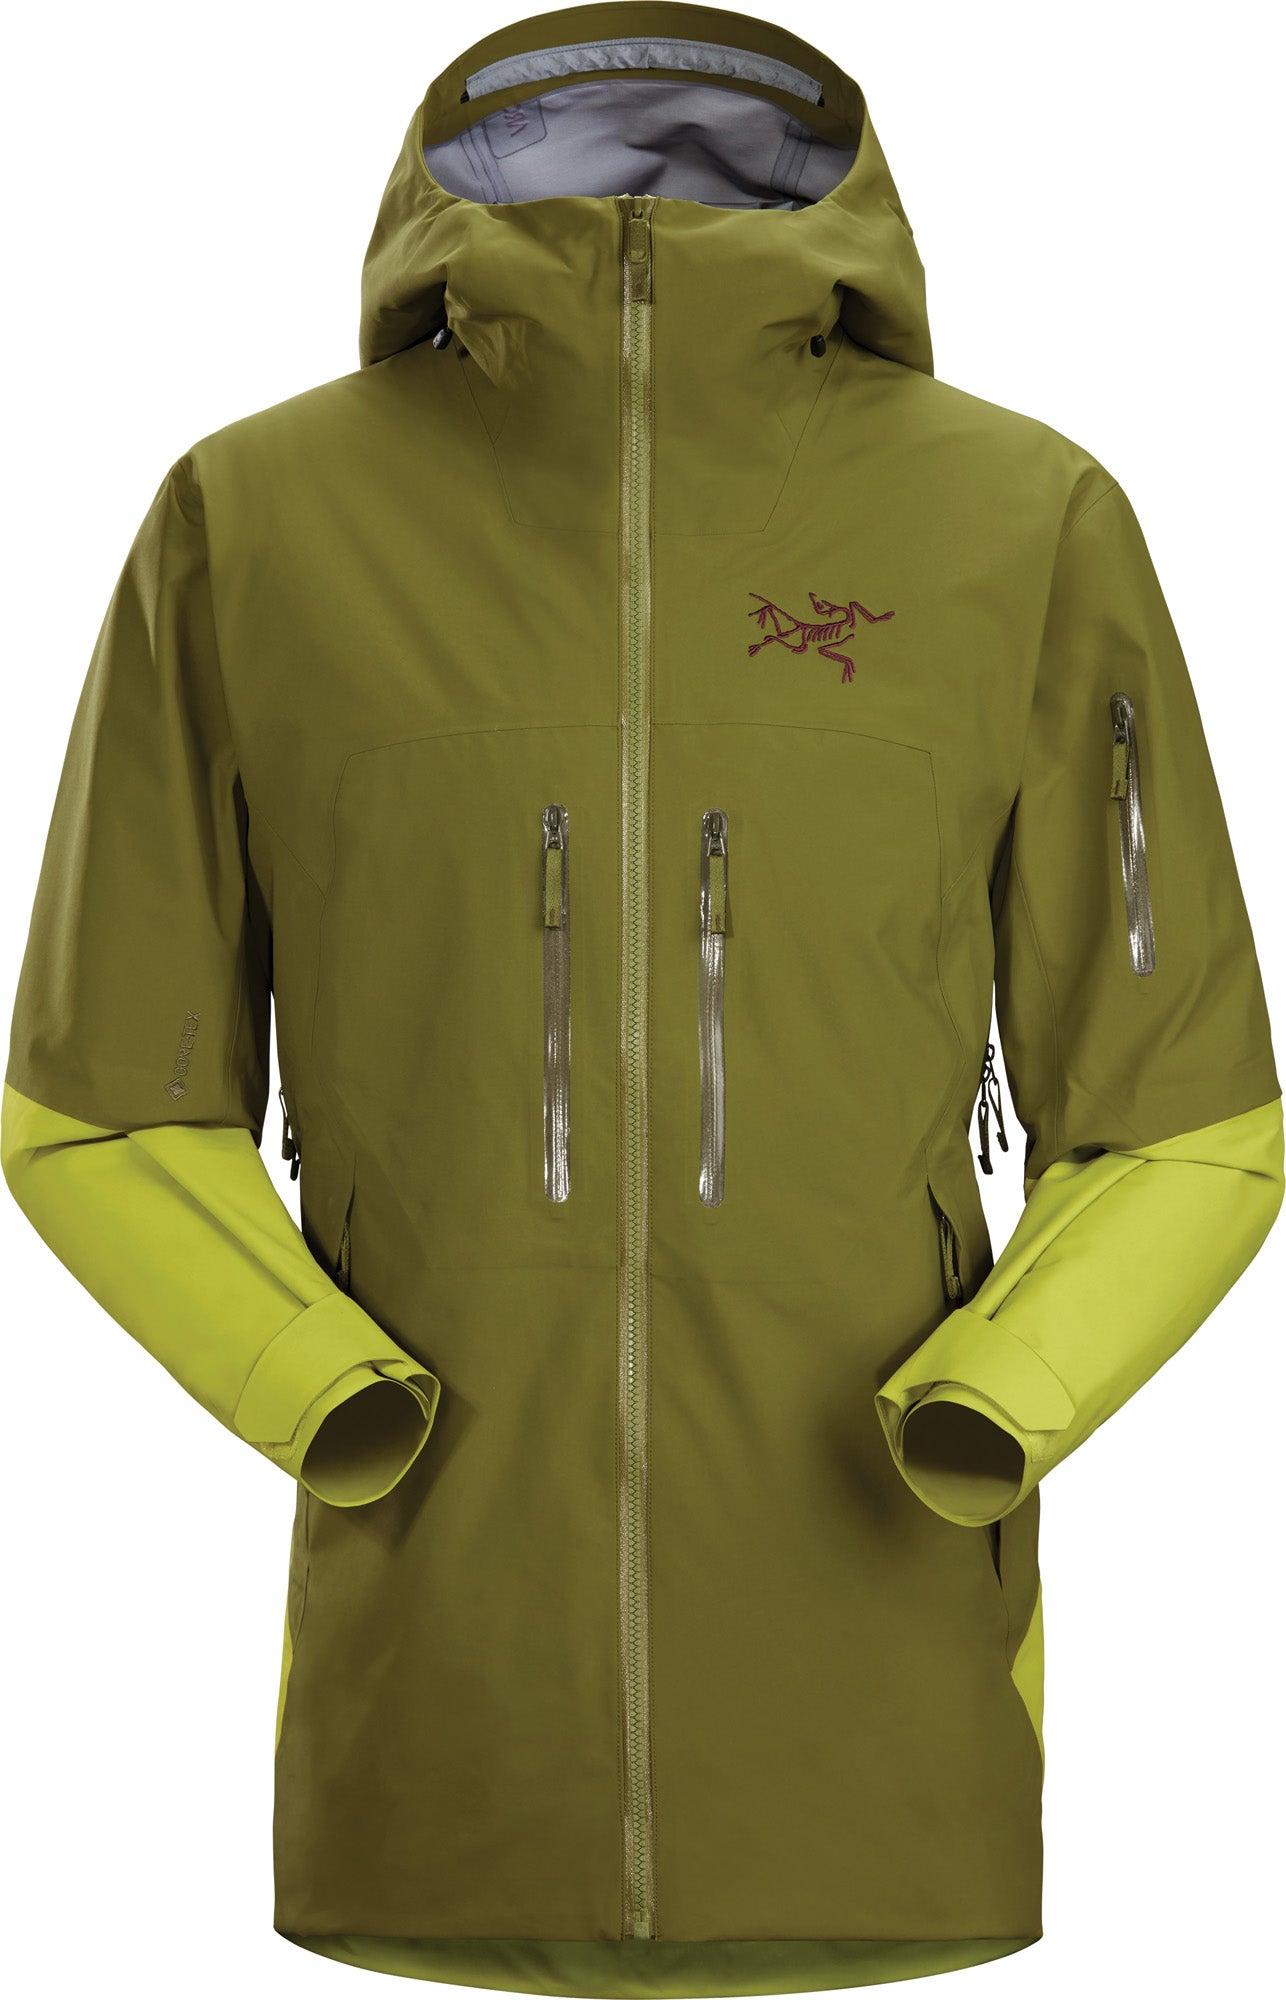 Men's Arc'teryx Sabre LT Ski Jacket